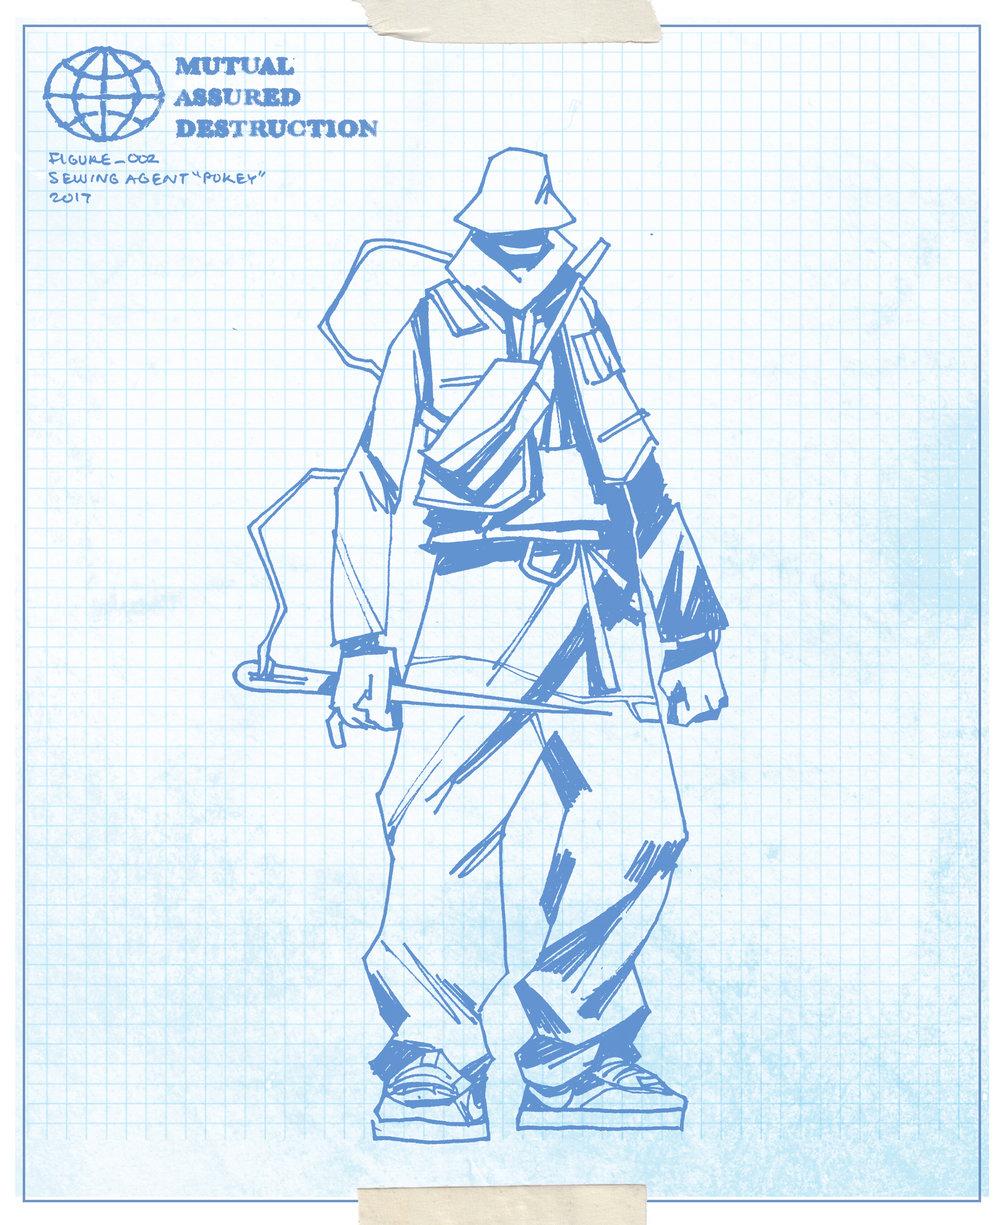 M.A.D Handbook Config.002